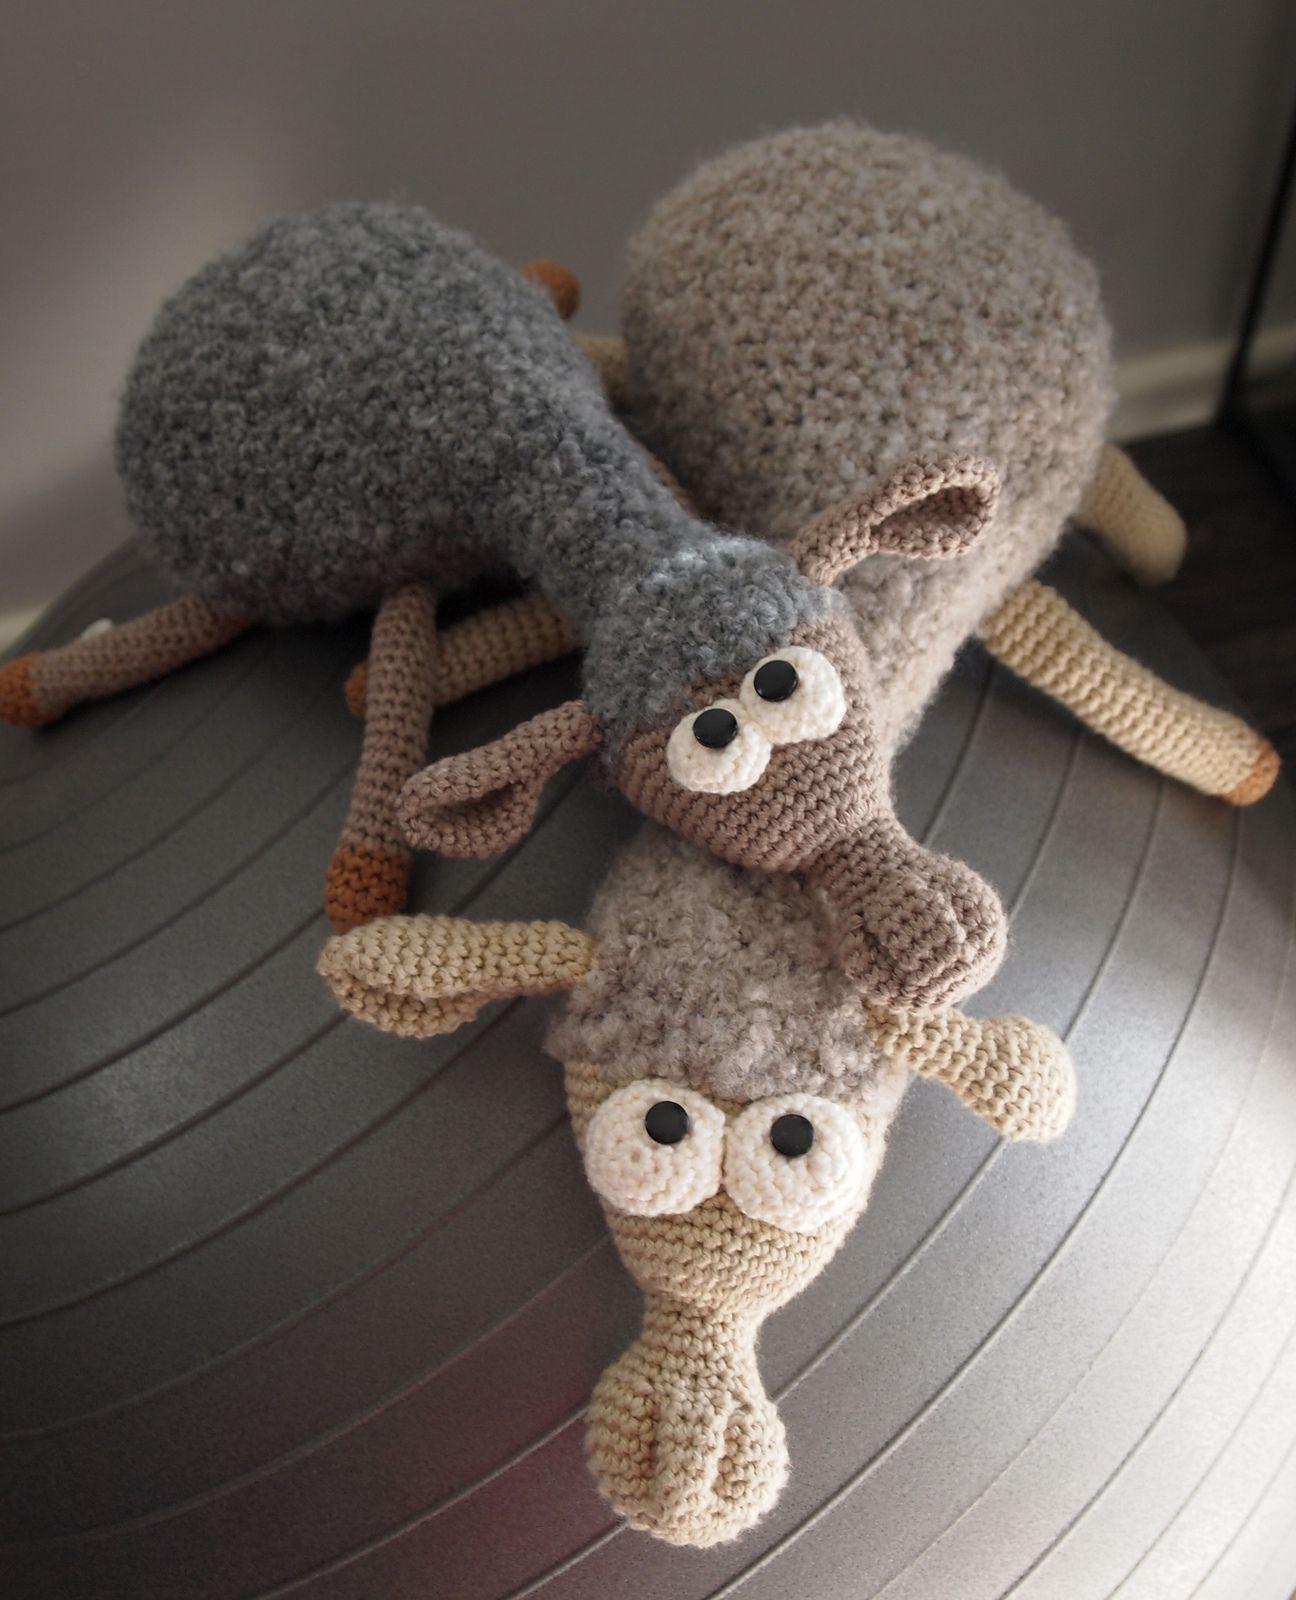 Amigurumi Free Pattern Ravelry : Dolly the sheep amigurumi fluffy toy by littleowlshut